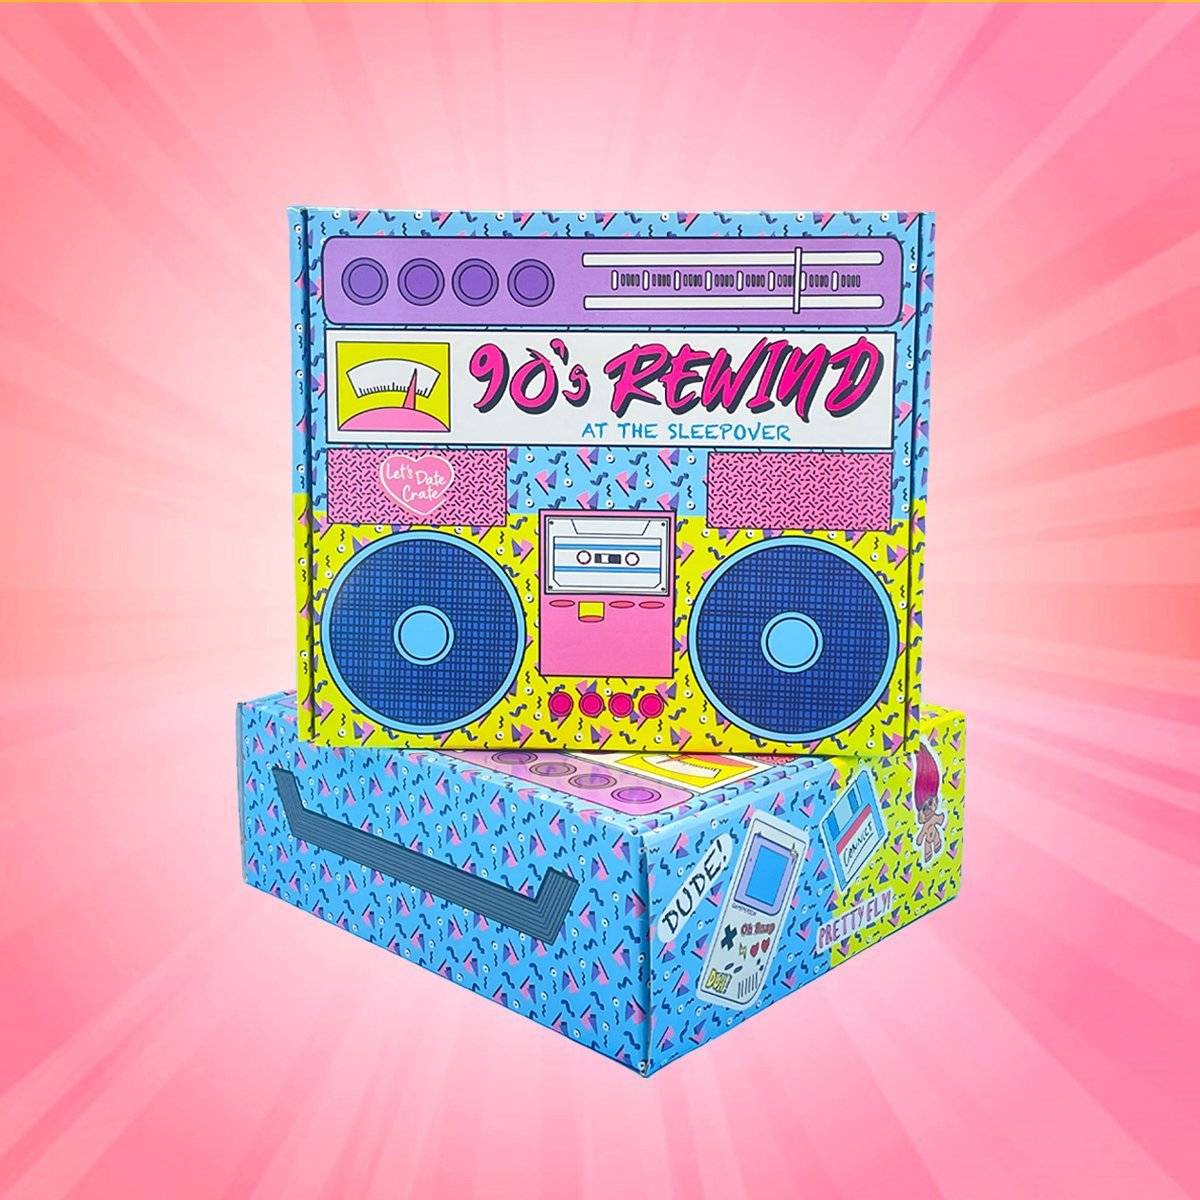 Letsdate crate date night at home box – 90s rewind